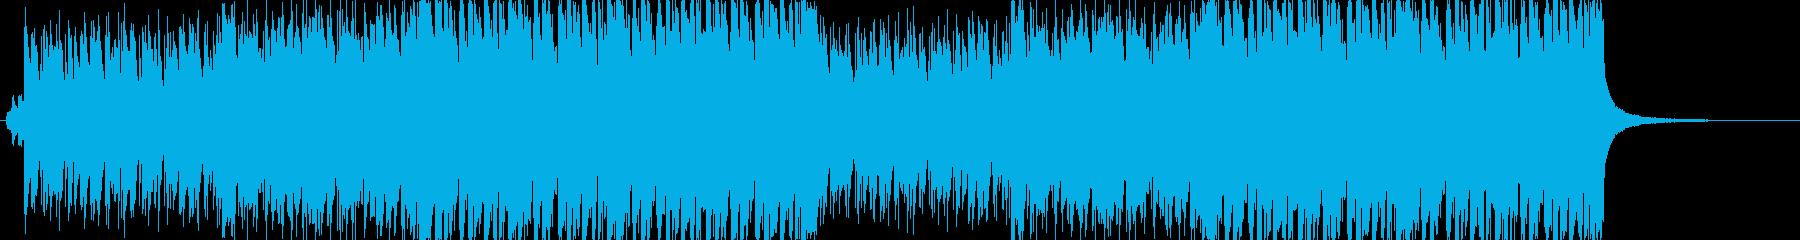 Happy Ukulele 3の再生済みの波形